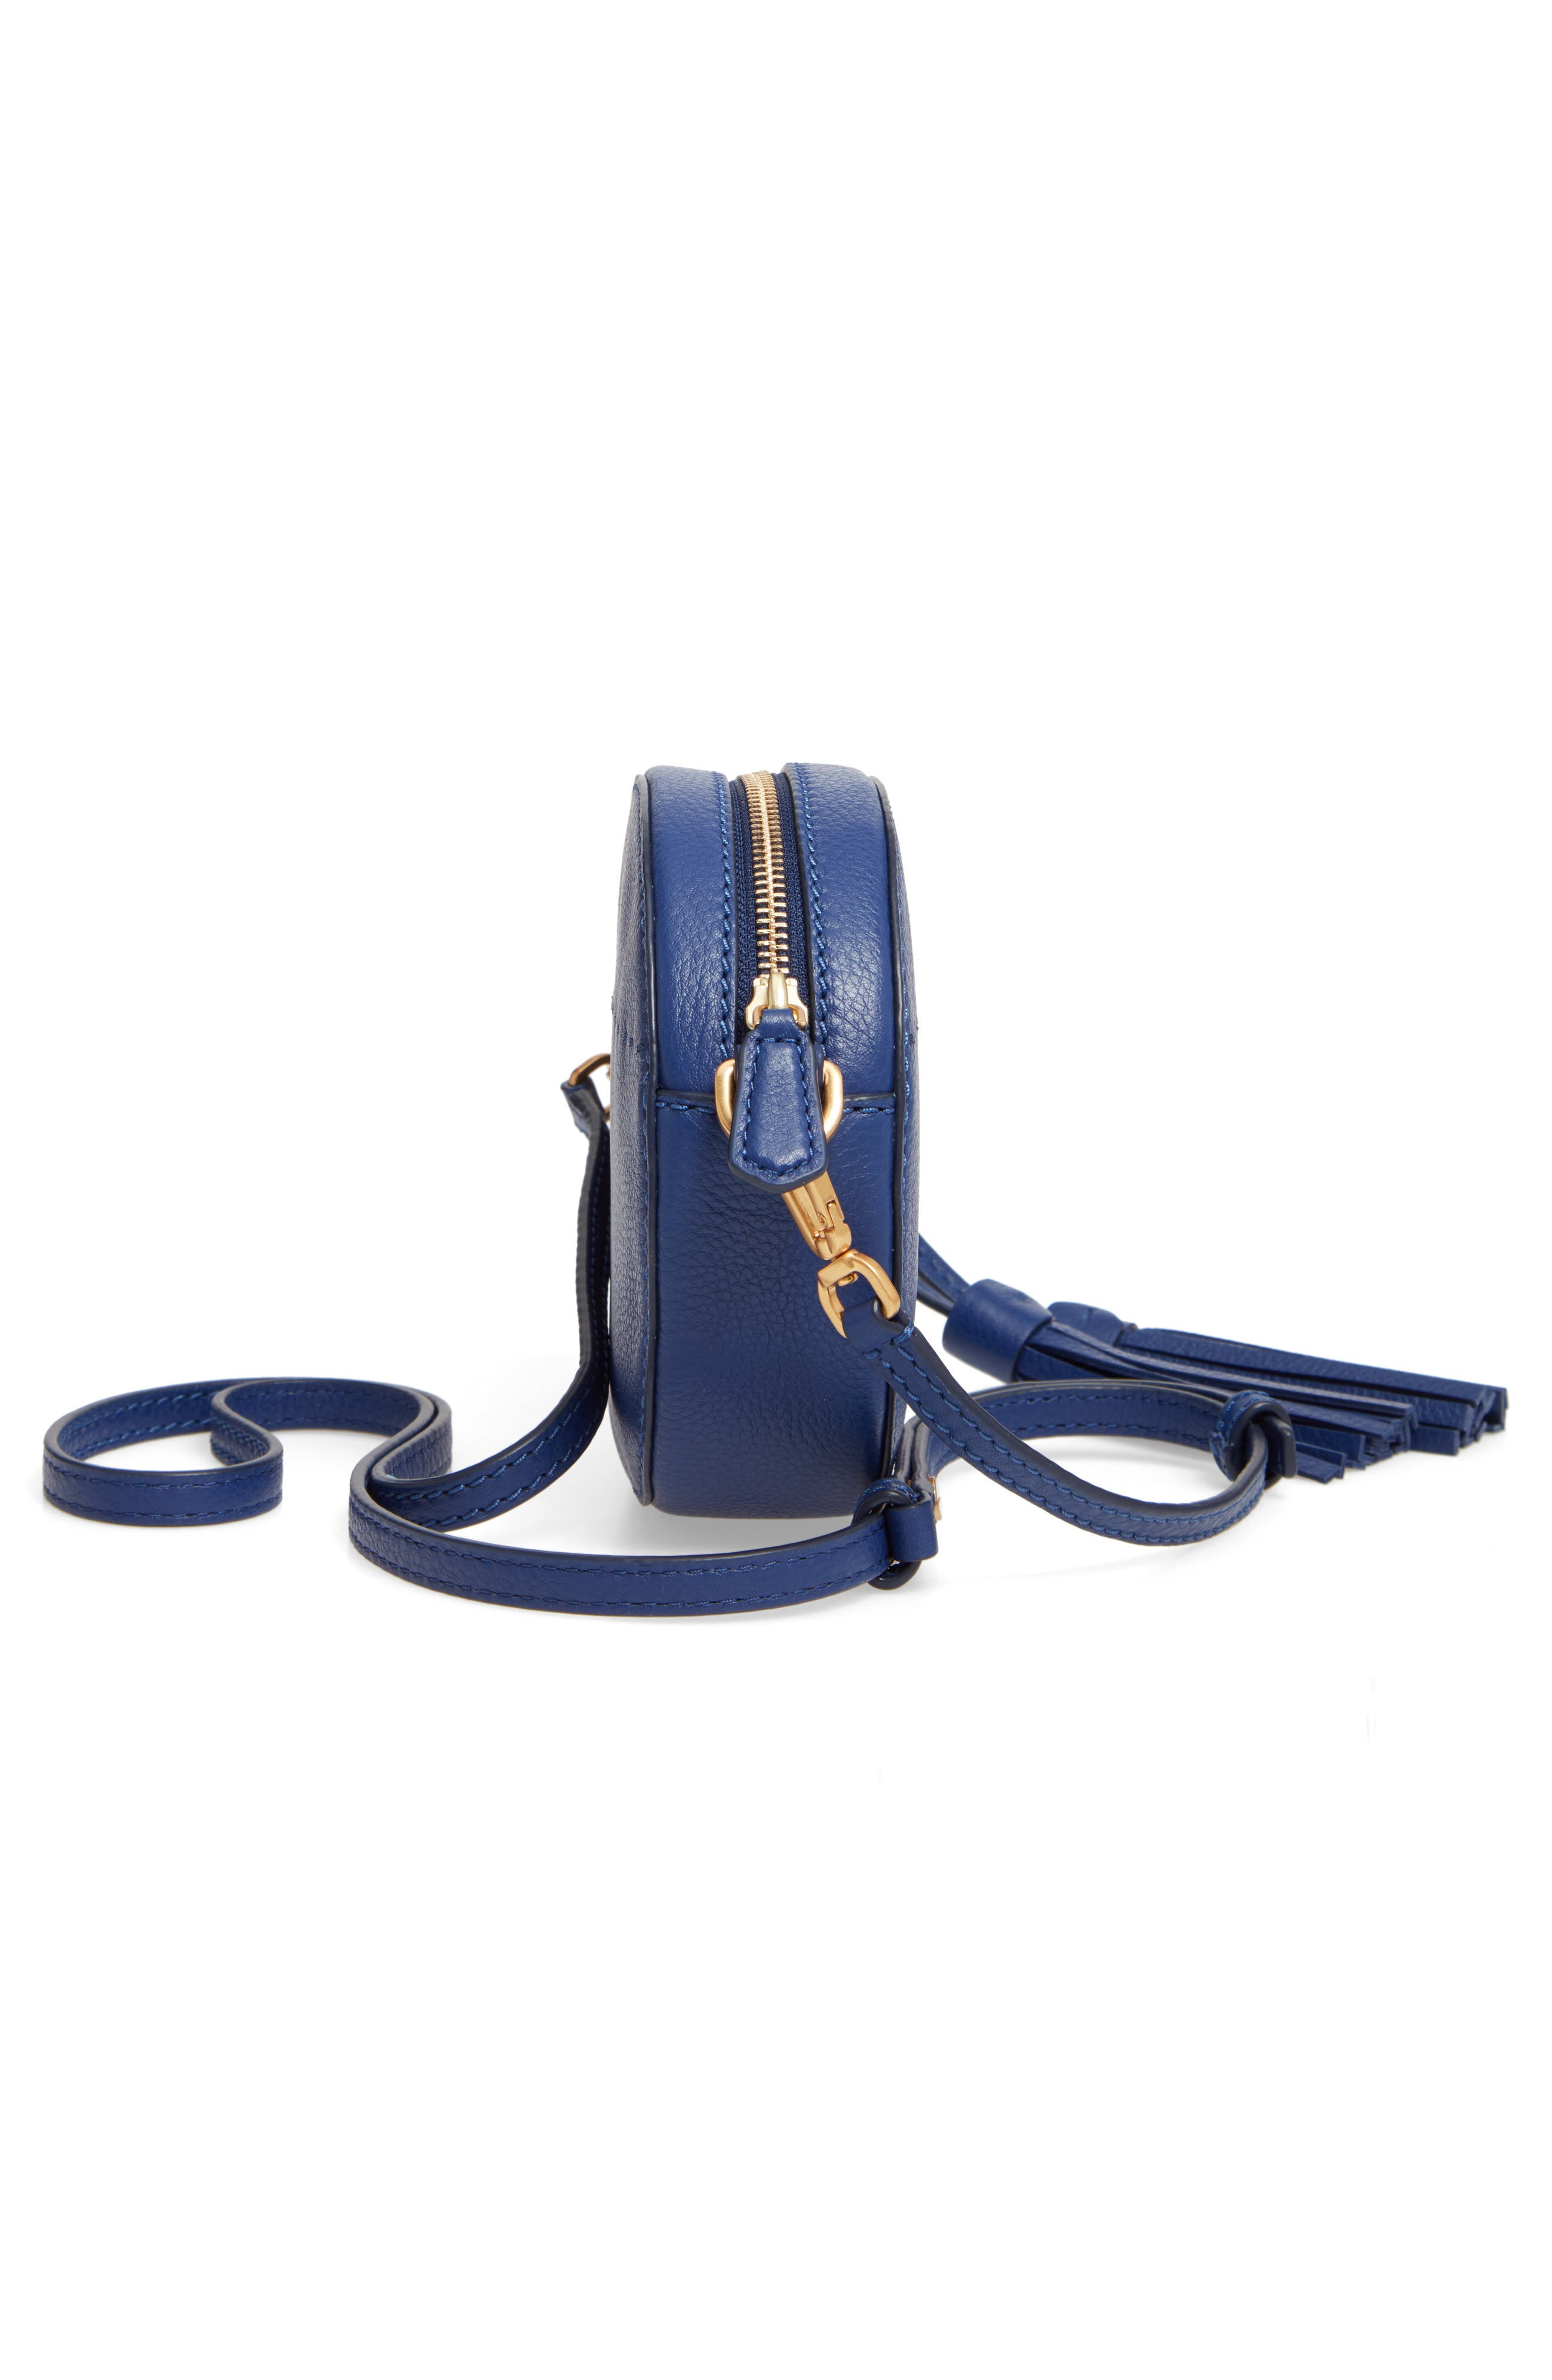 McGraw Leather Crossbody Bag,                             Alternate thumbnail 5, color,                             BRIGHT INDIGO